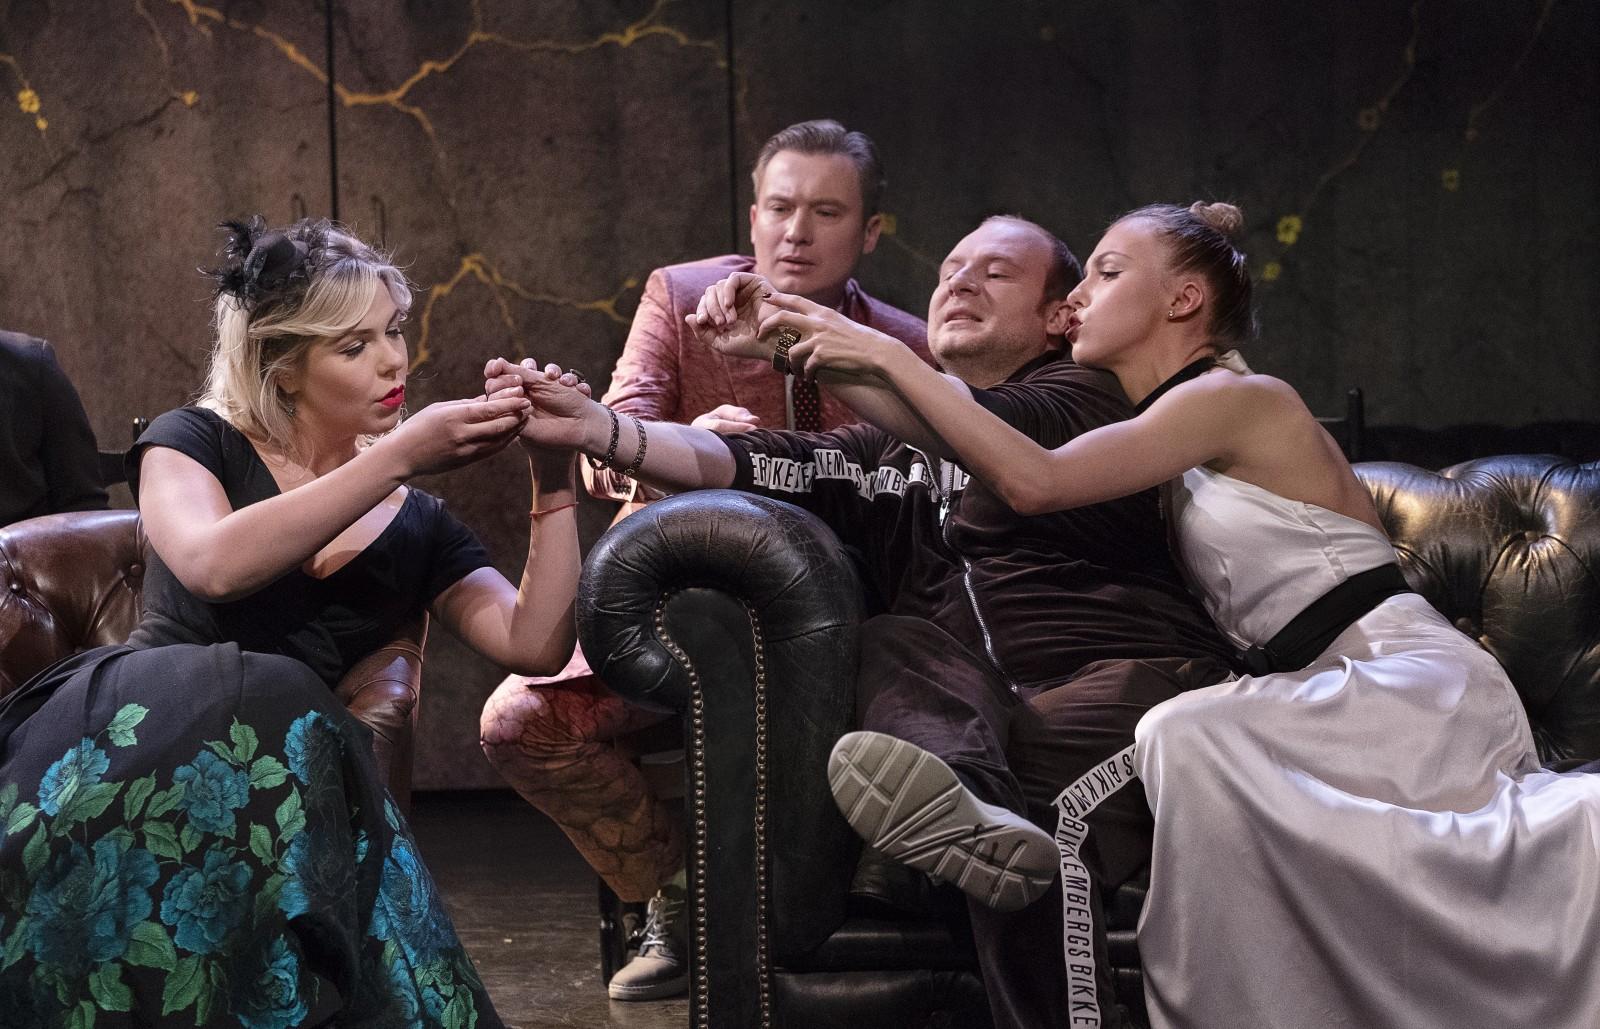 http://www.modern-theatre.ru/assets/images/na-dne/yuliya-meshkova/dscf7111.jpg